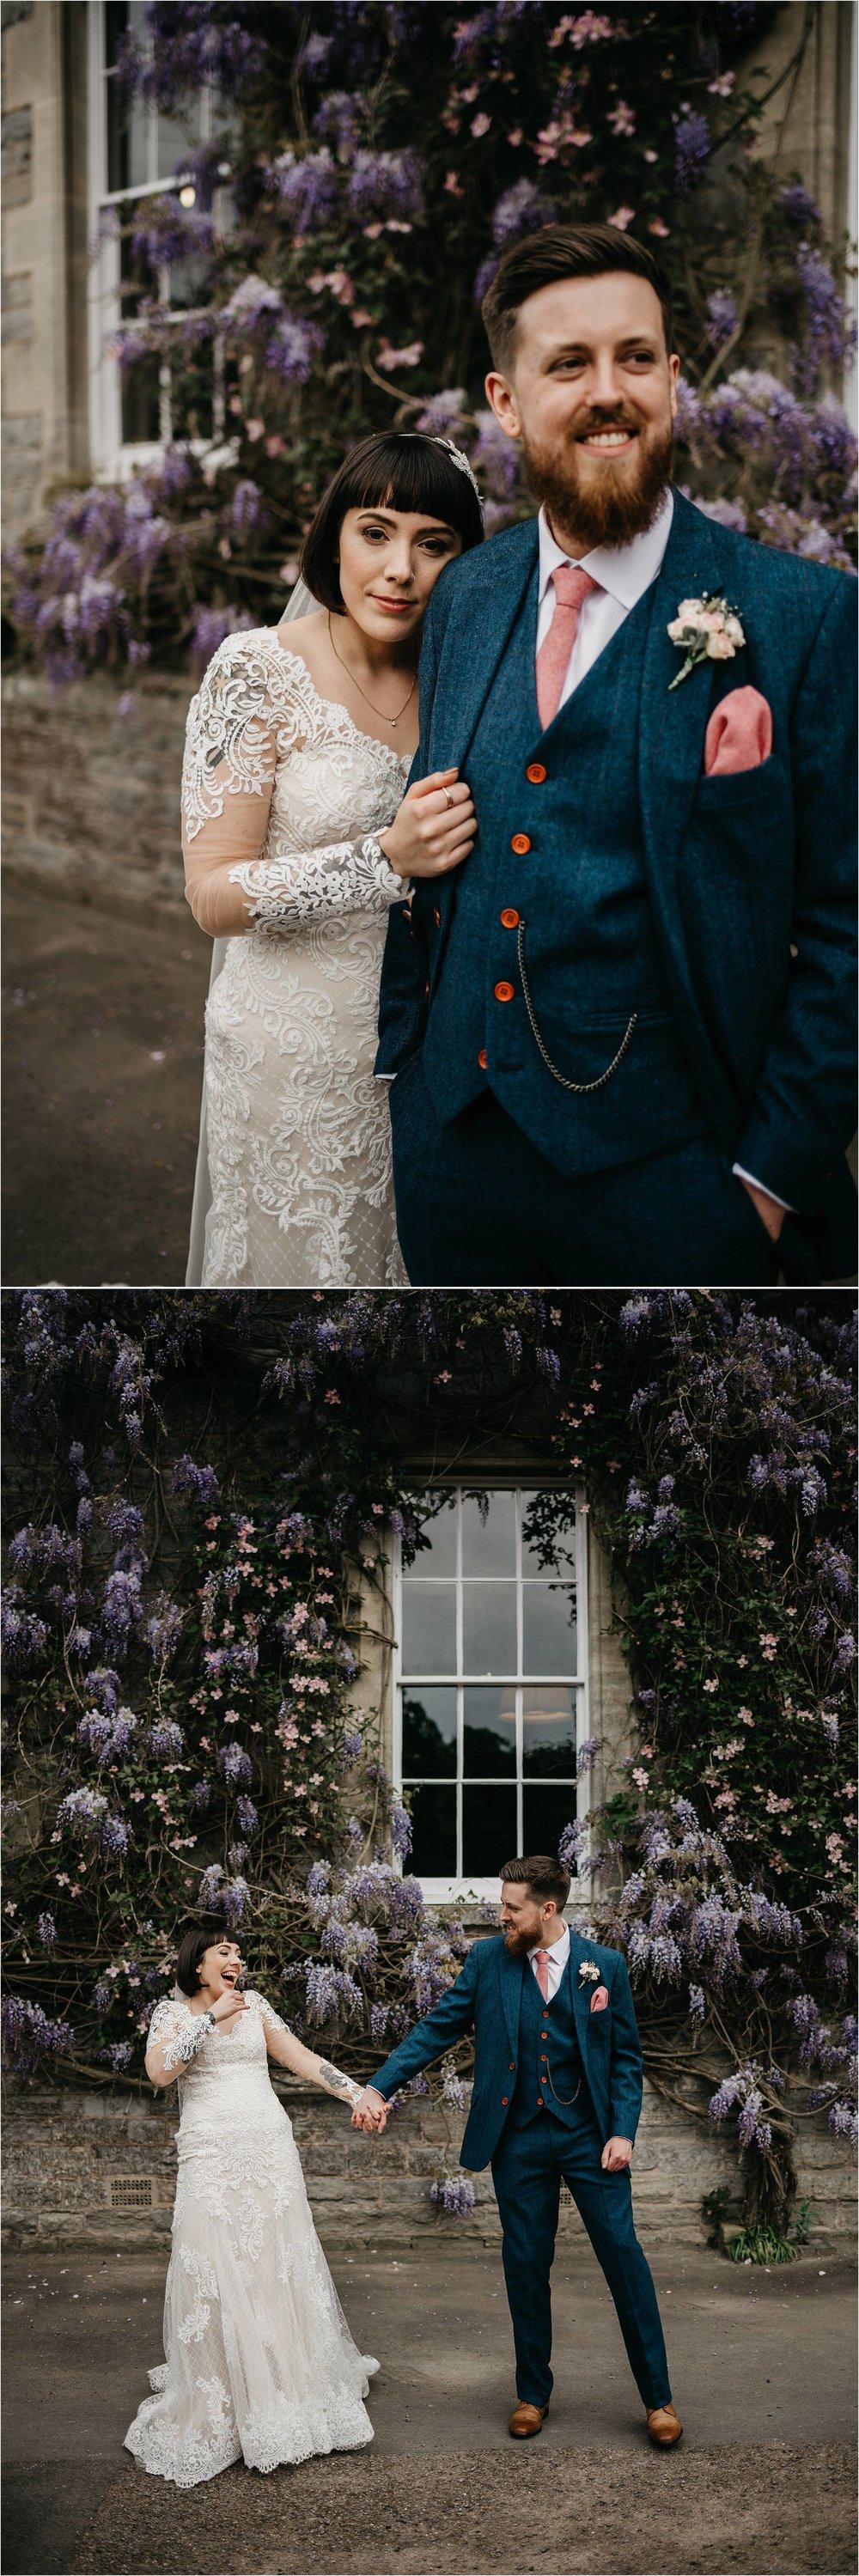 Elmore Court Wedding Photography_0090.jpg